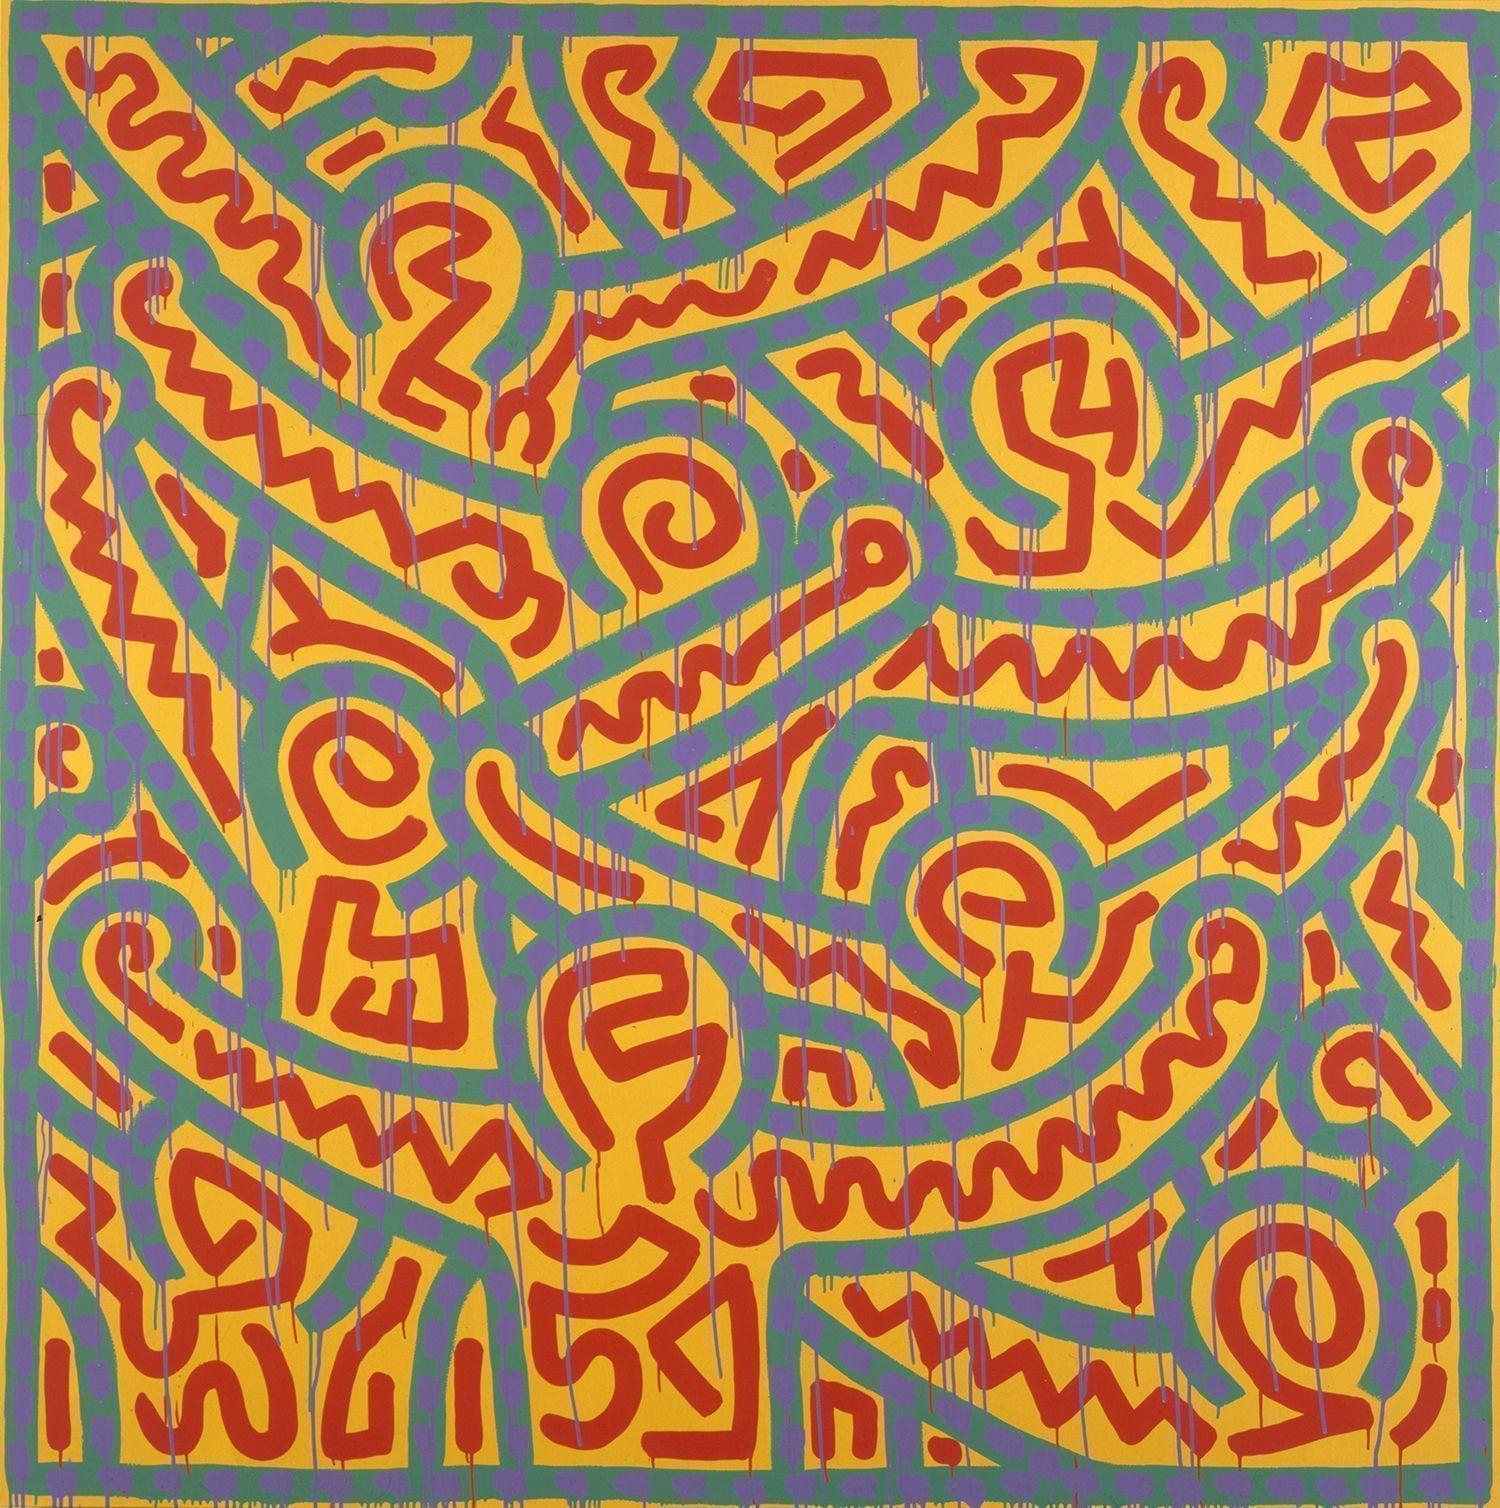 Keith Haring, Ohne Titel, 1989, Acryl und Emailfarbe auf Leinwand (© Keith Haring Foundation)